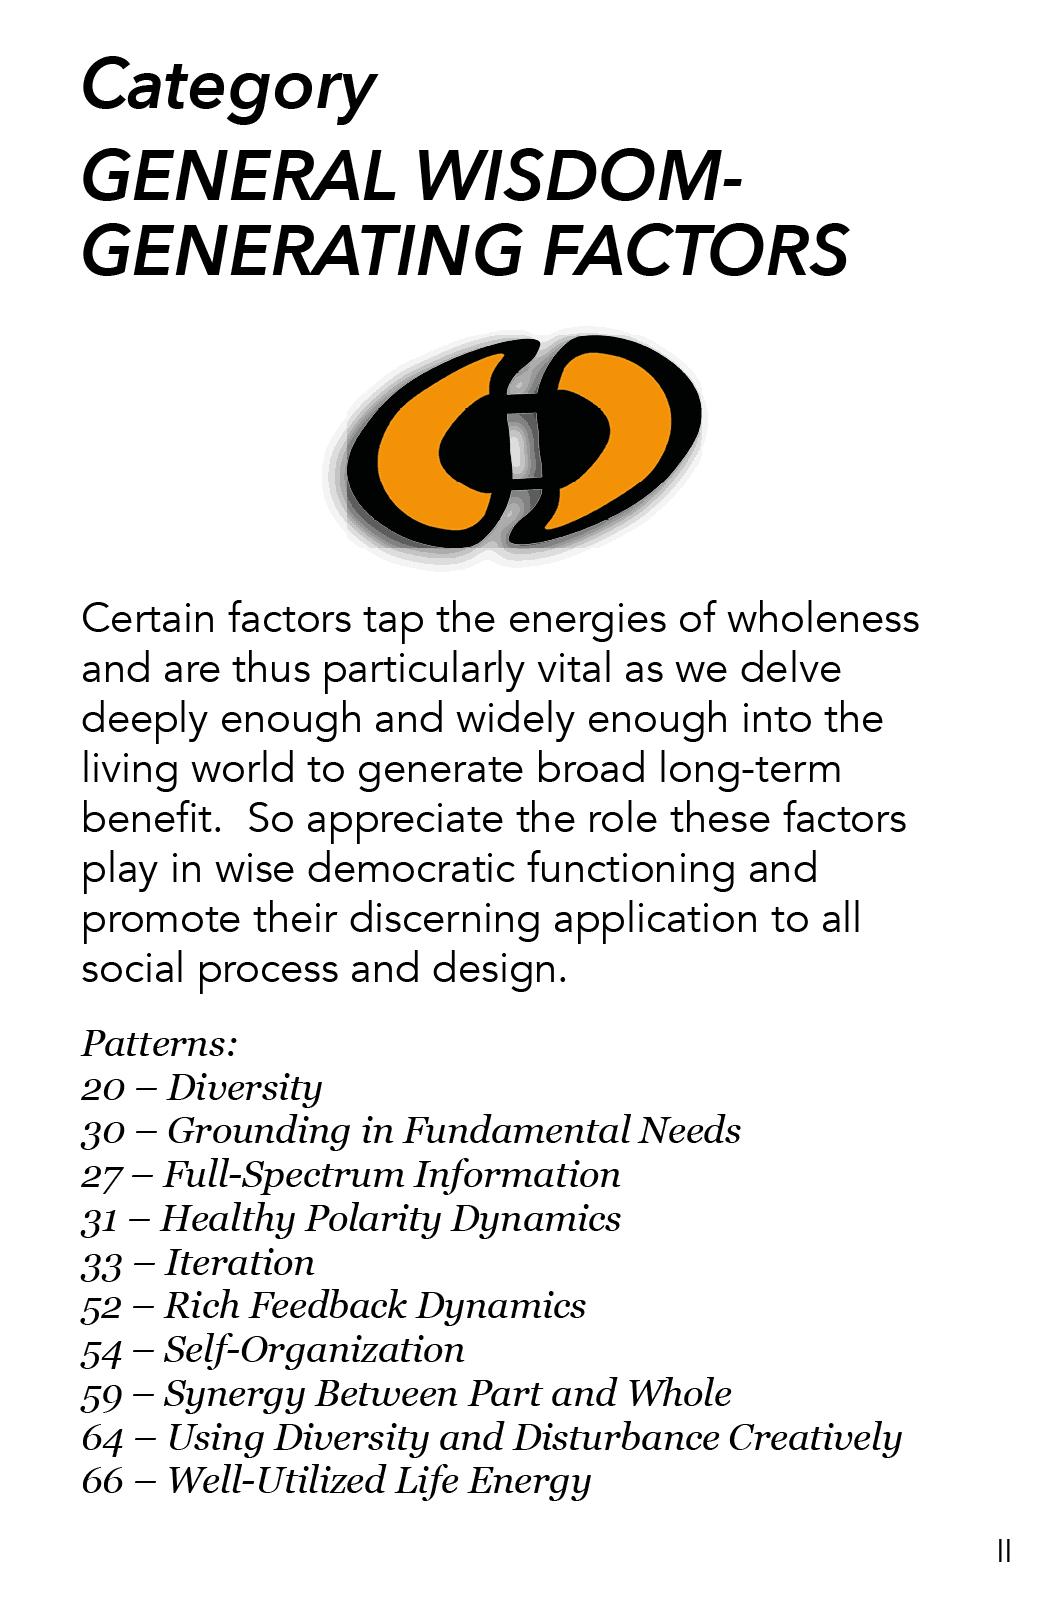 AA - 2 - General Wisdom Generating Factors